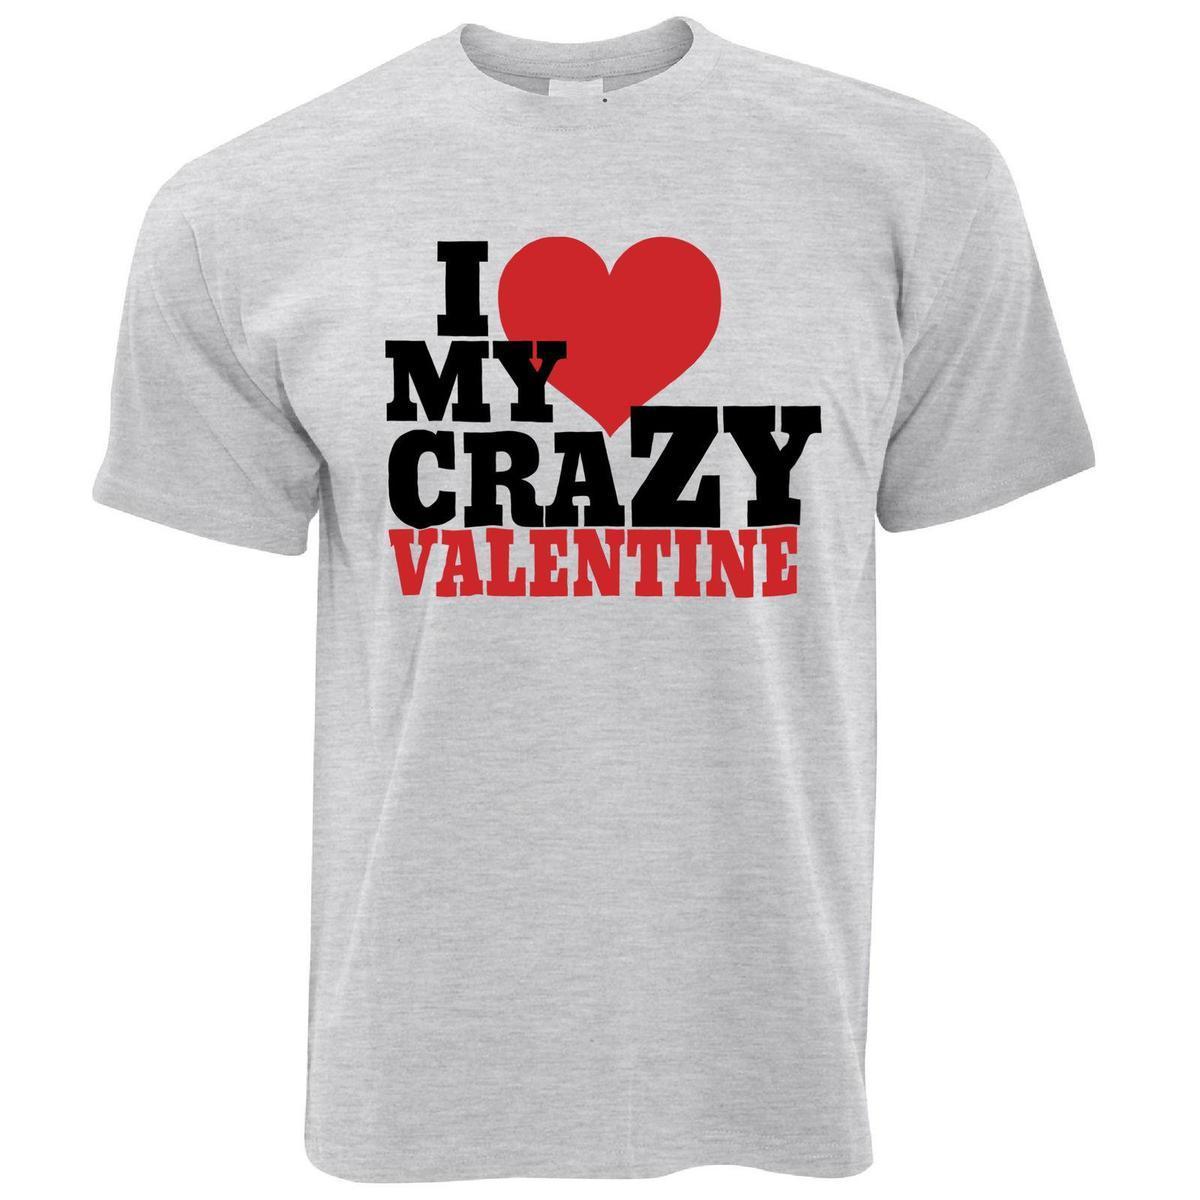 I Love My Crazy Valentine Mens T Shirt Sassy Fun Couples Valentines